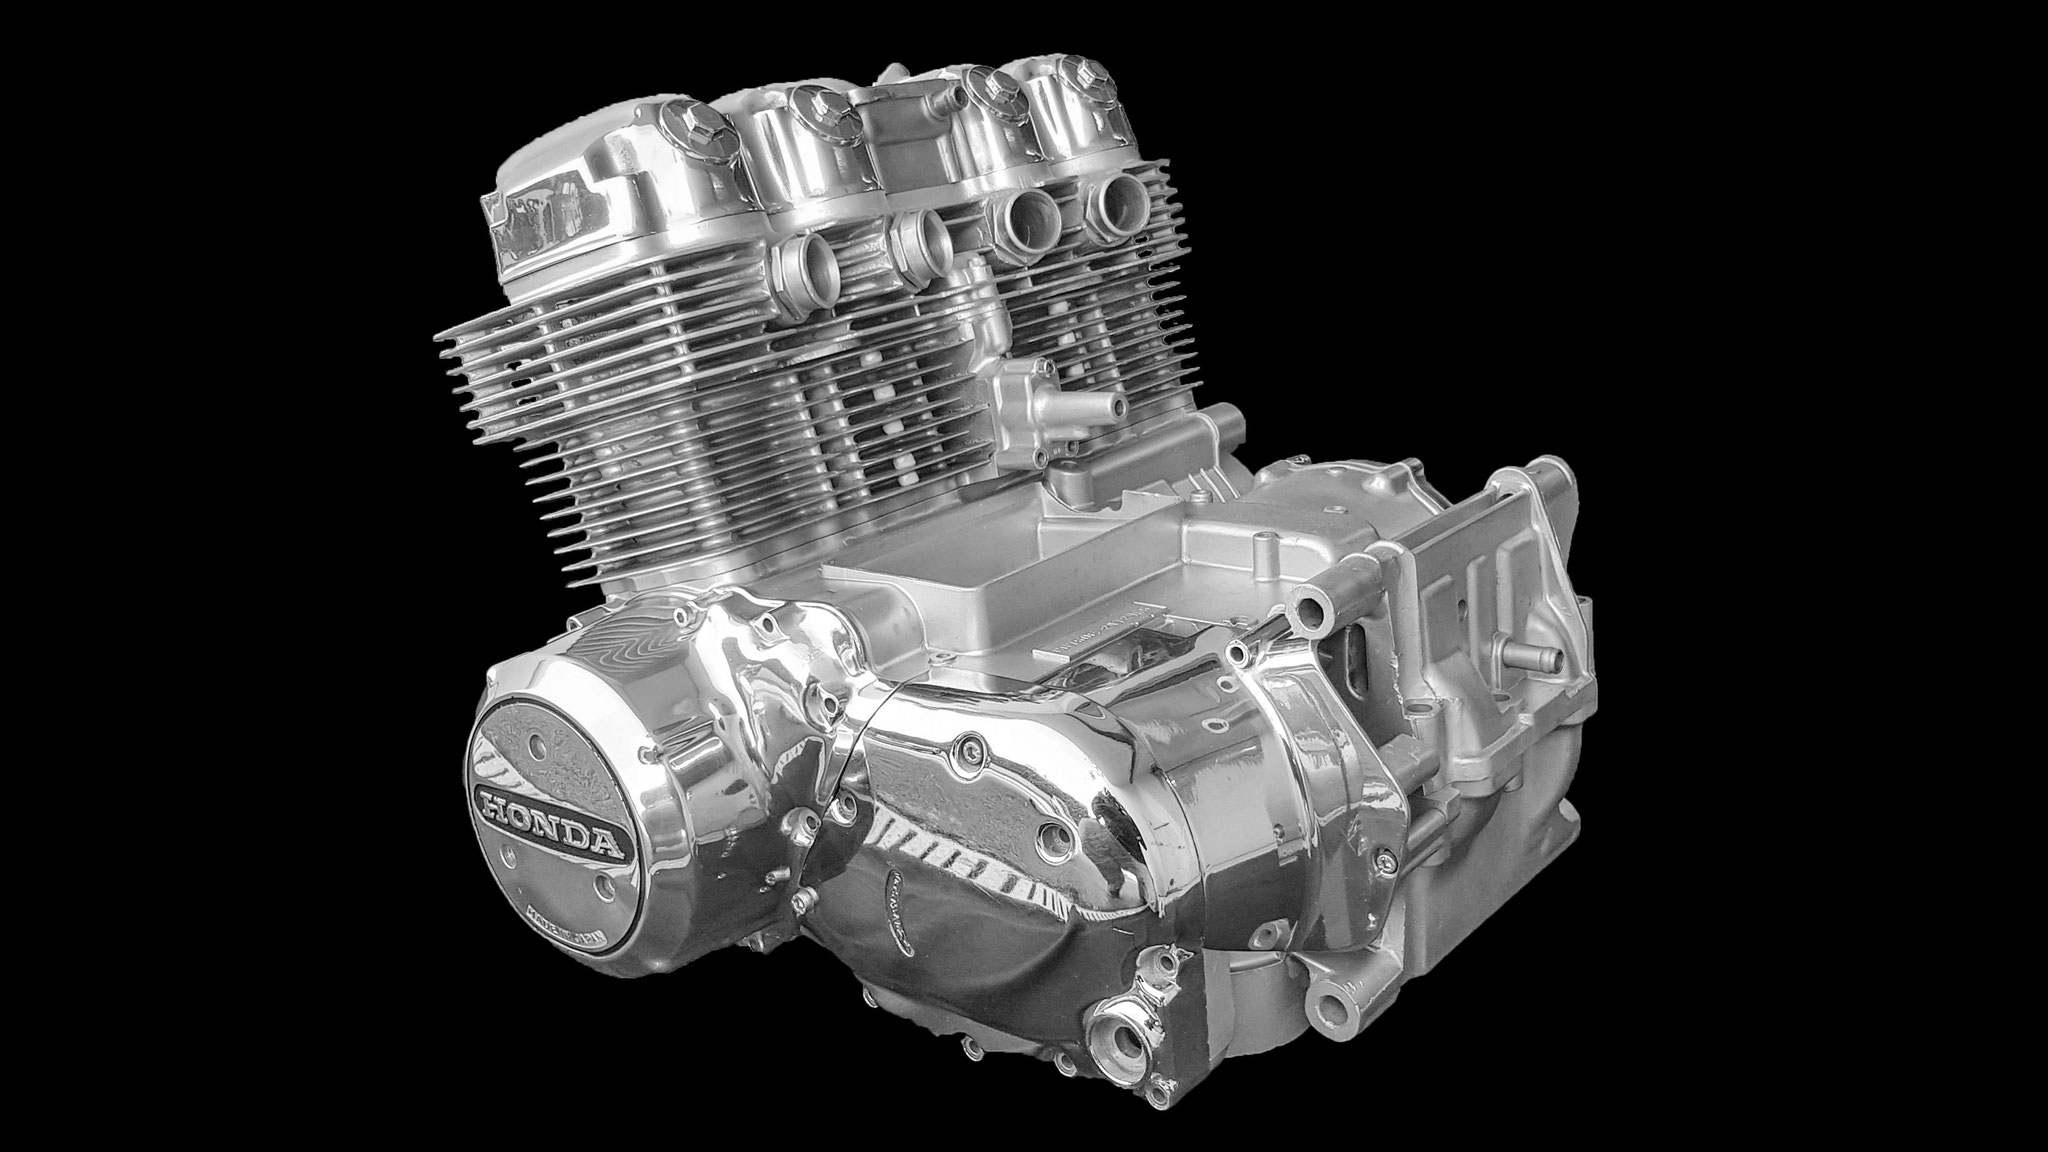 microbillage moteur Honda CB750